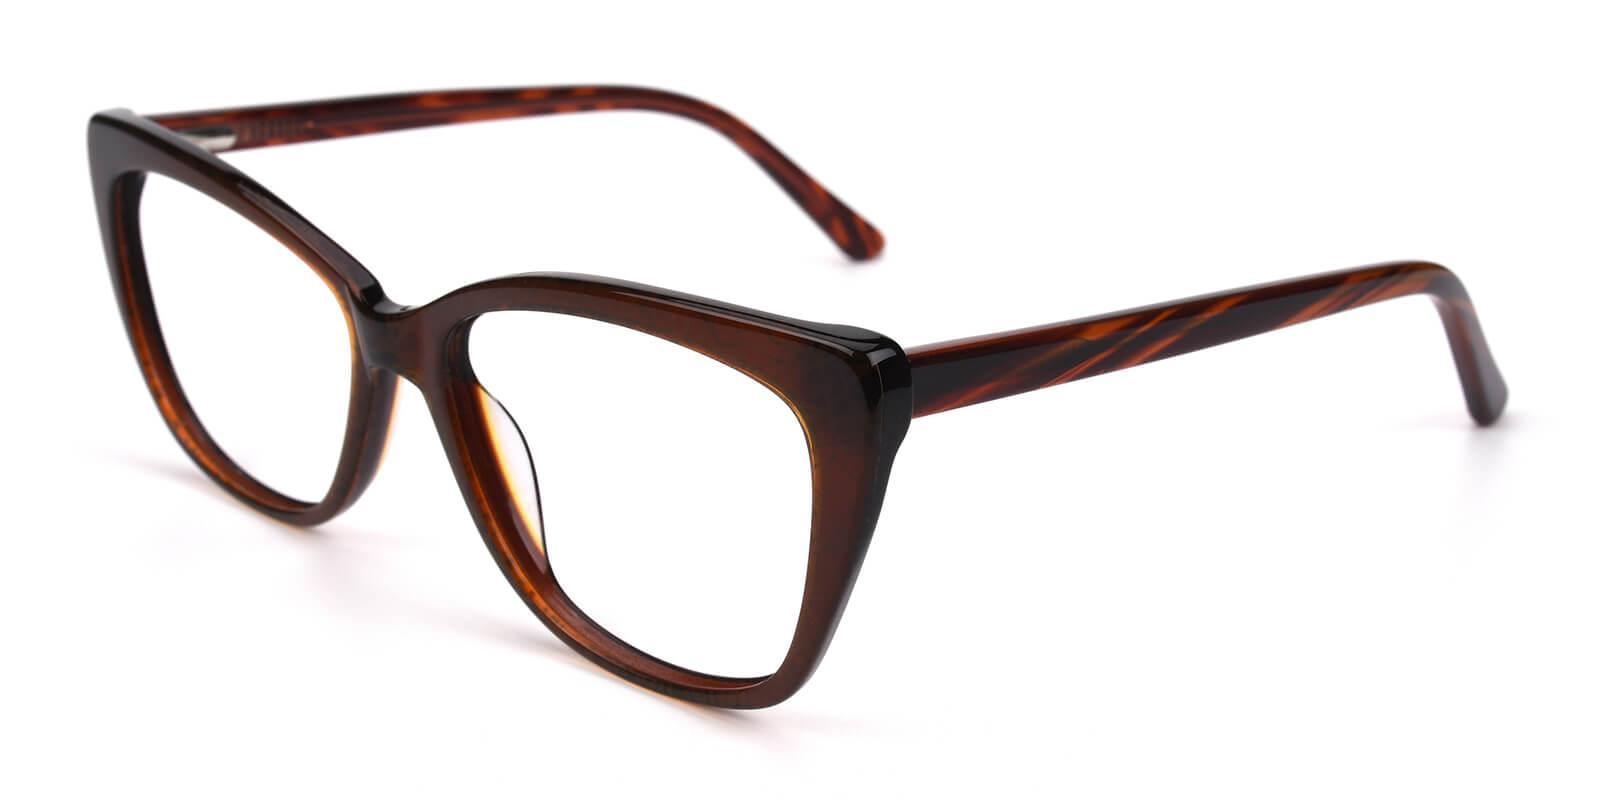 Kiko-Leopard-Cat-Acetate-Eyeglasses-additional1